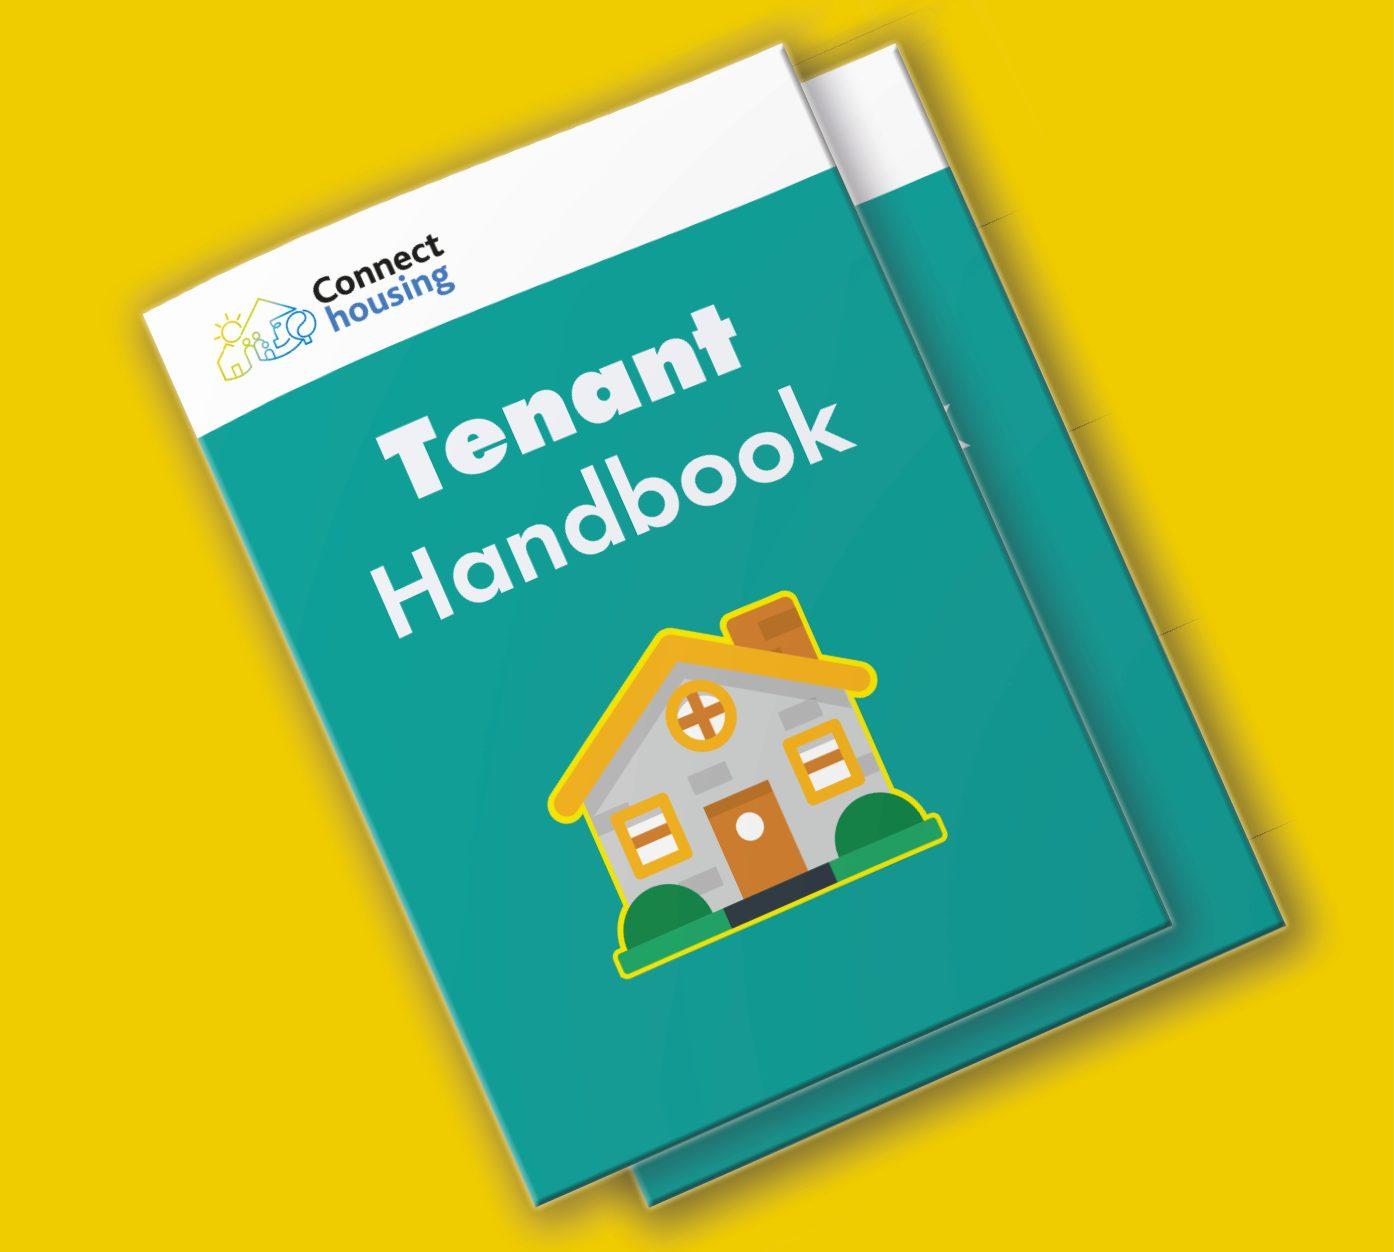 Tenant handbooks